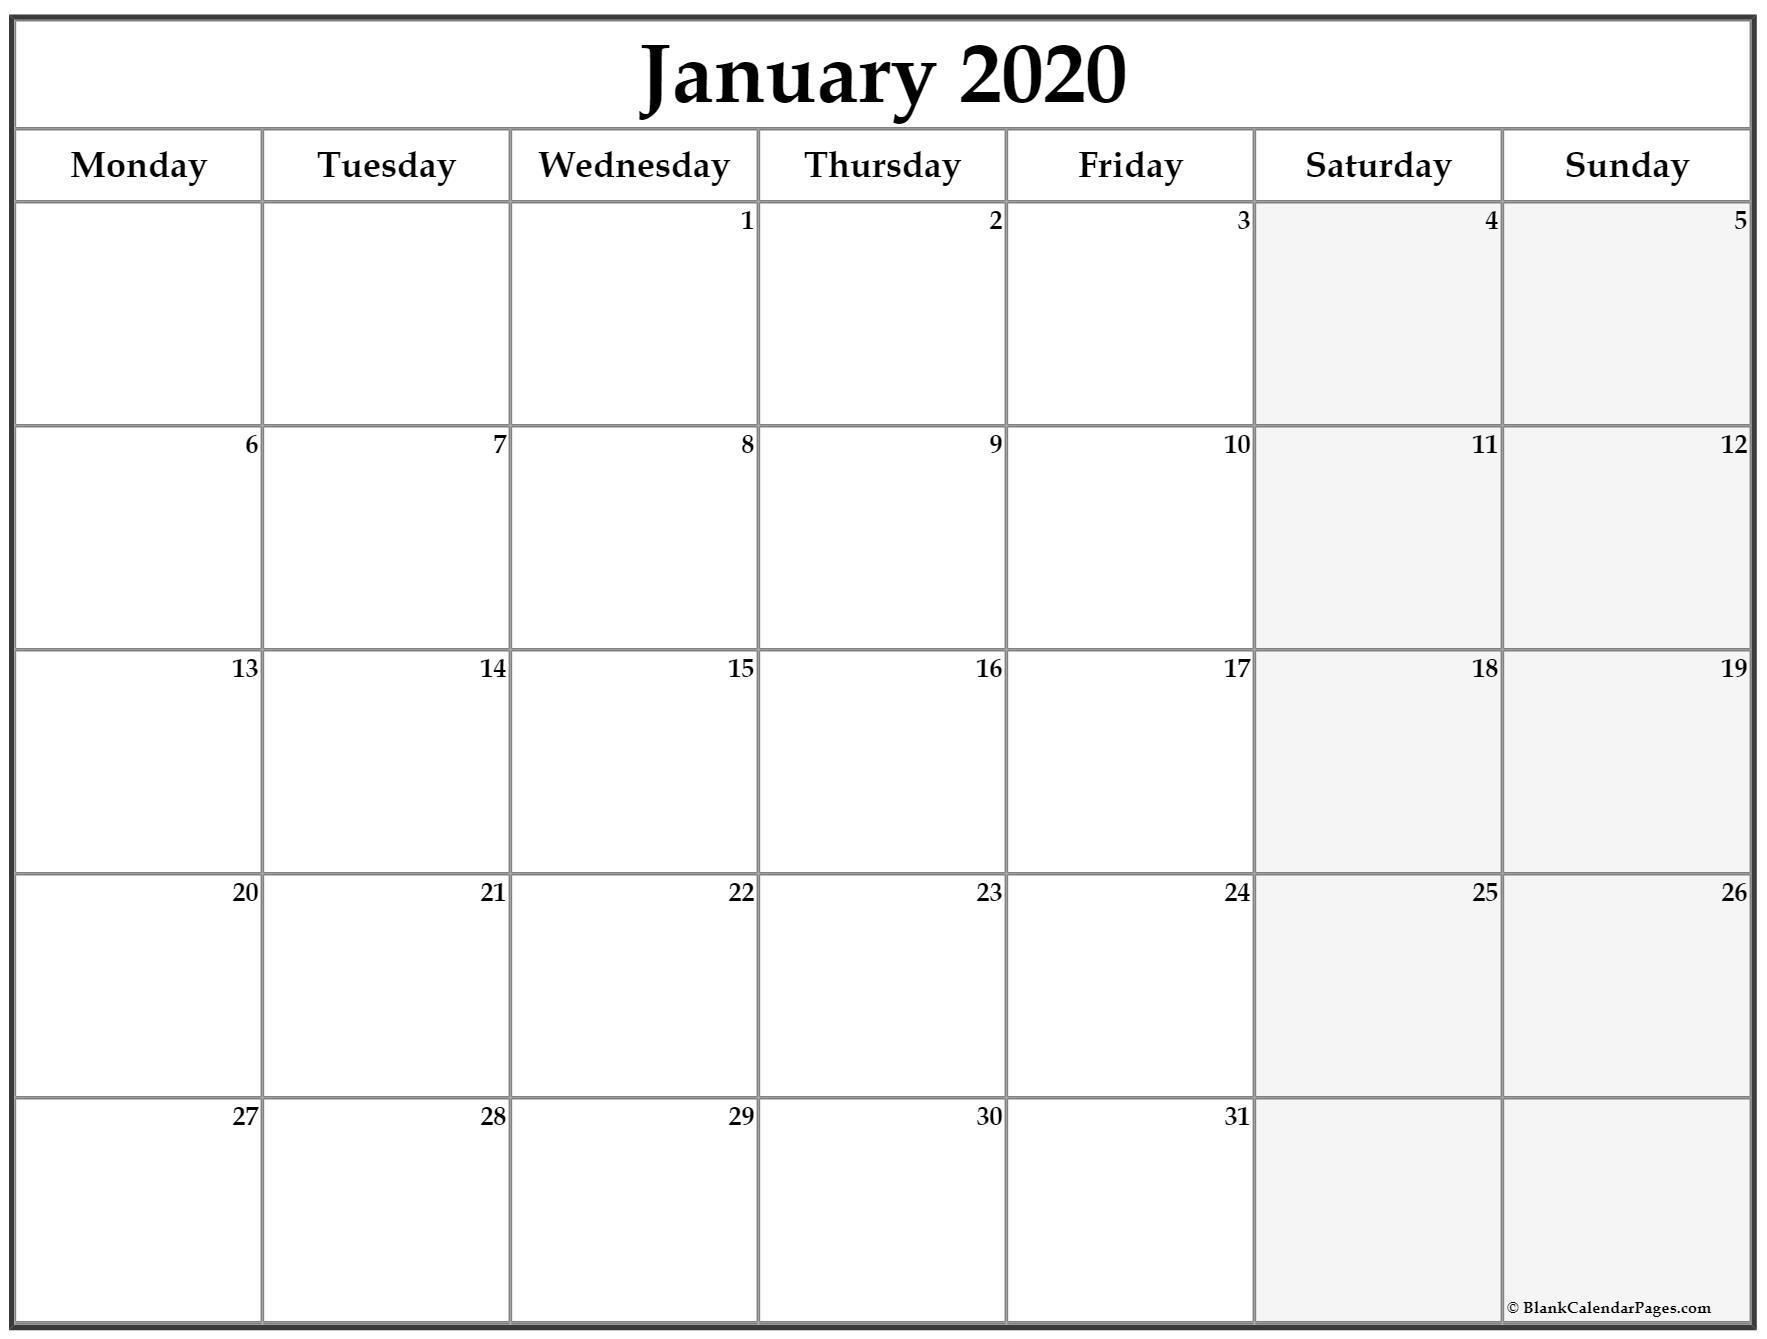 Get Printable Calendar Monday-Sunday